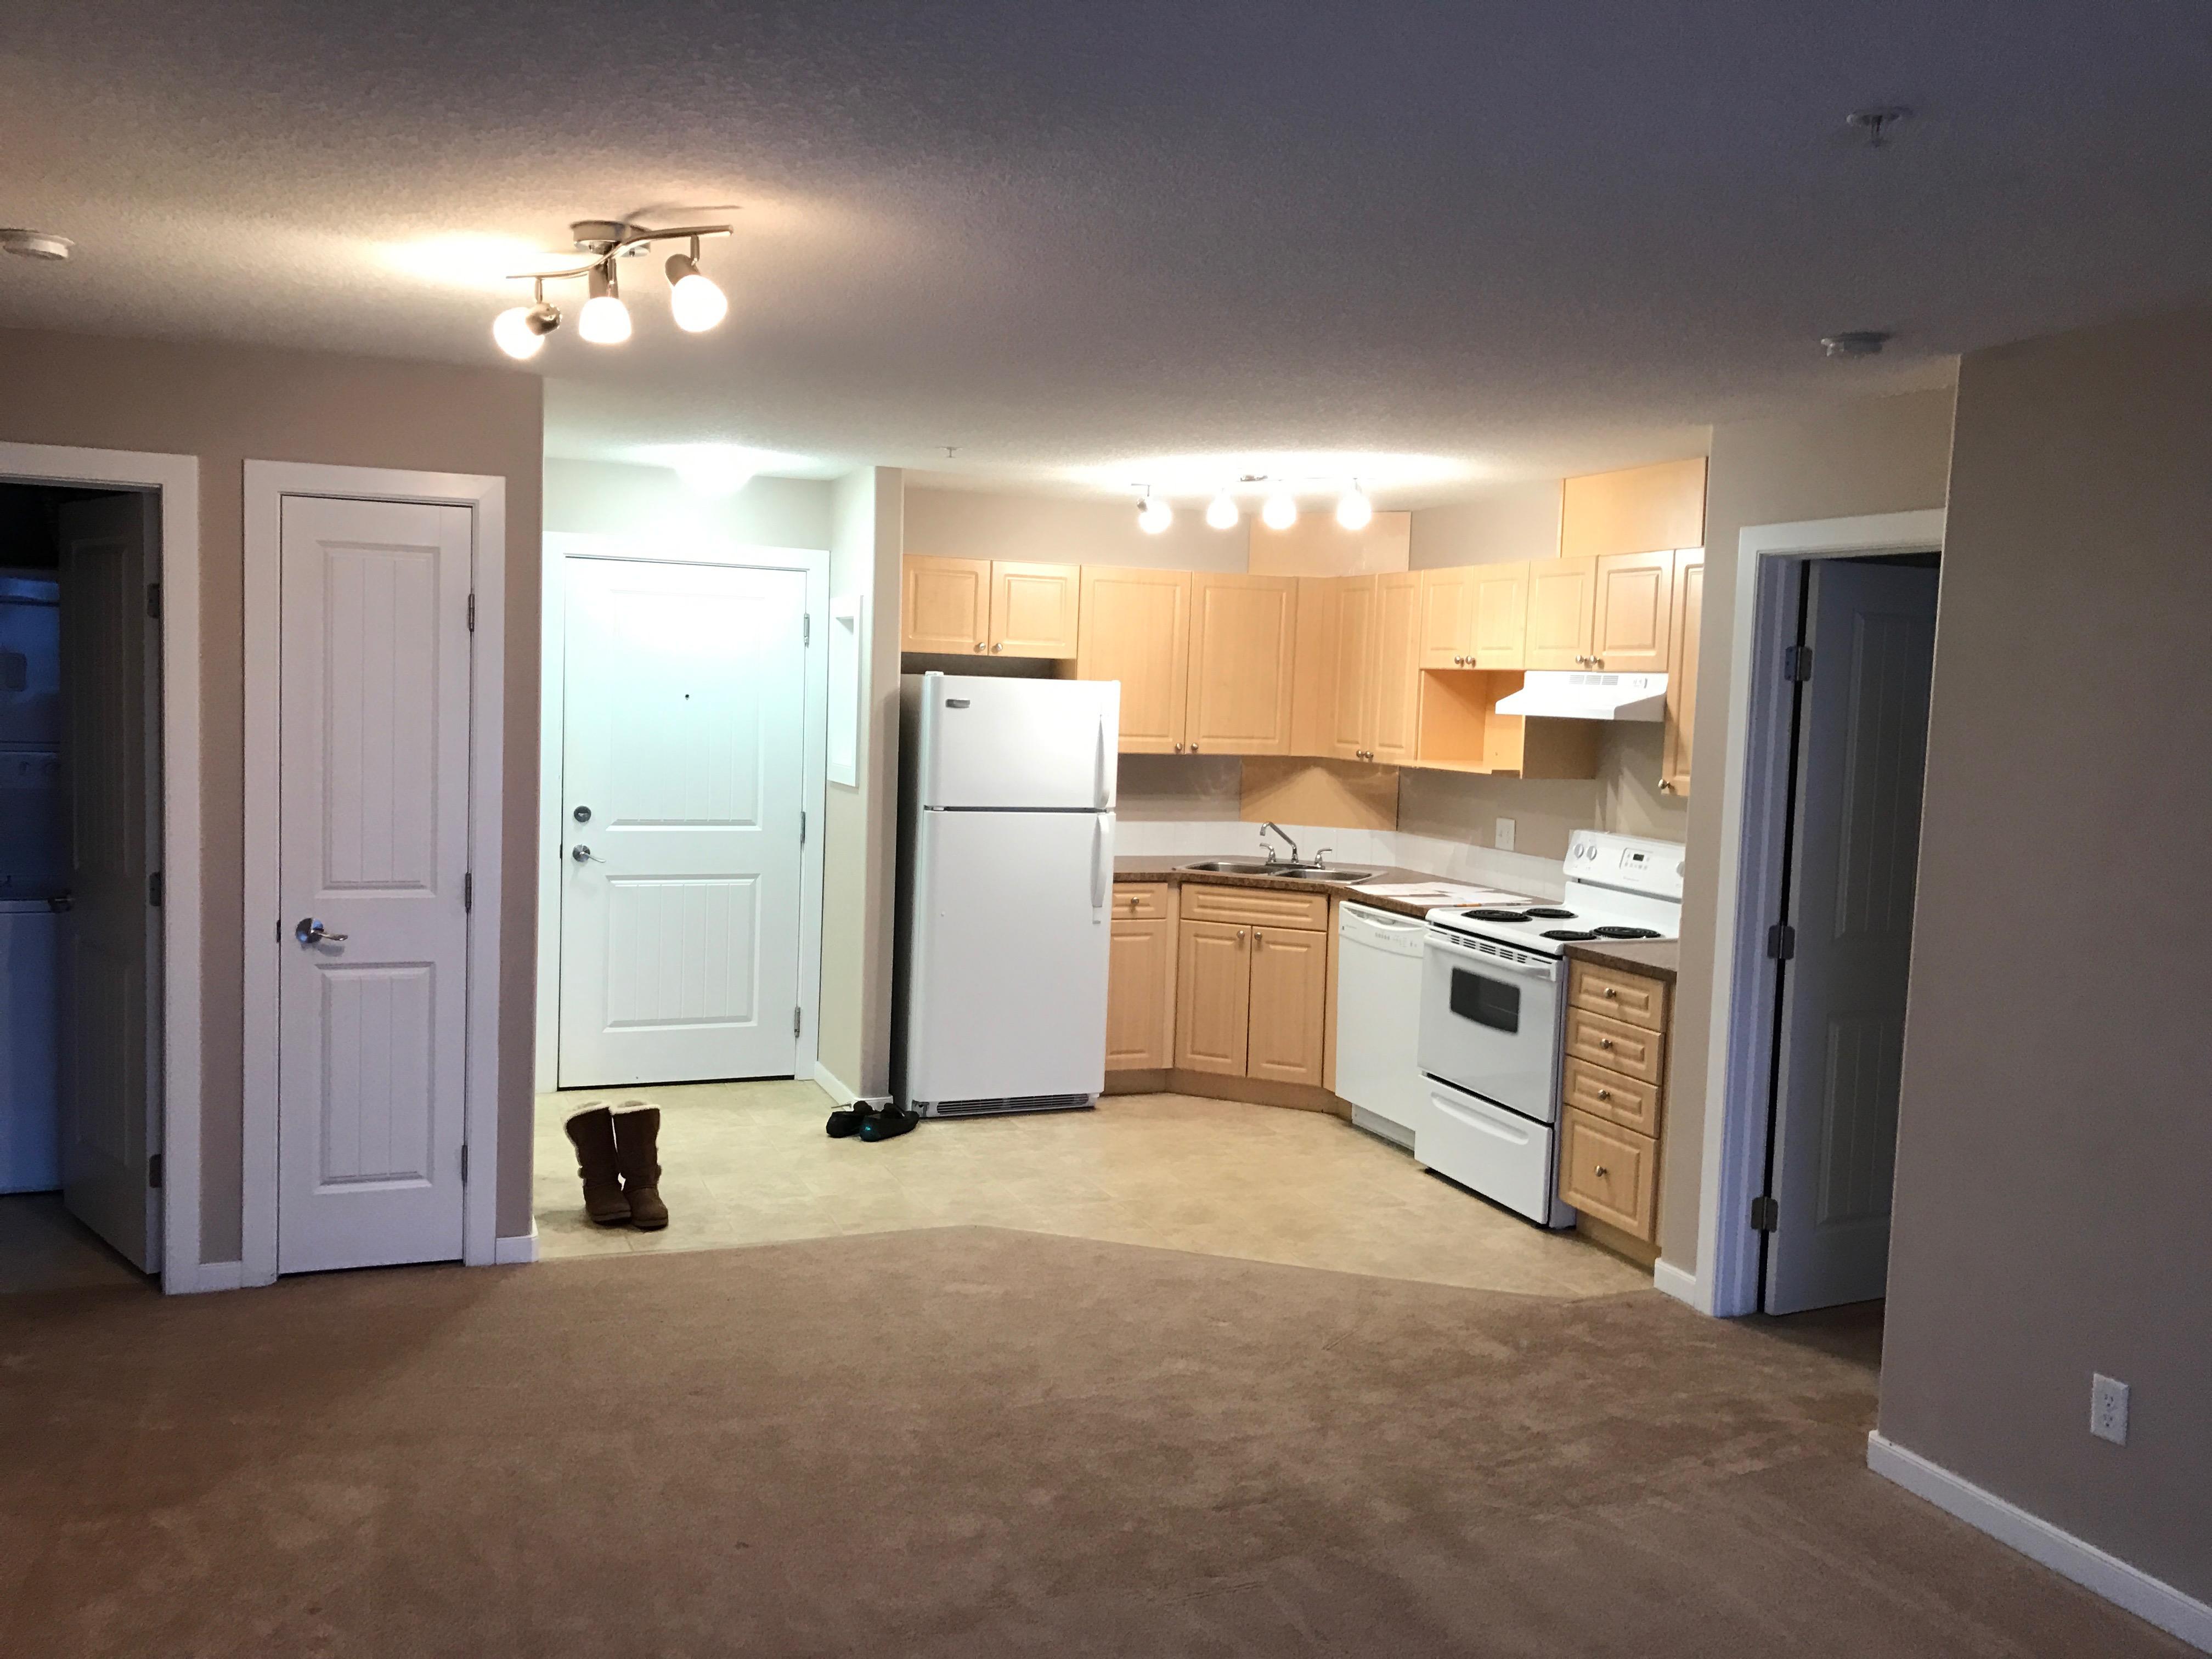 2 bed 2 bath condo. Spruce Grove. $1100/month